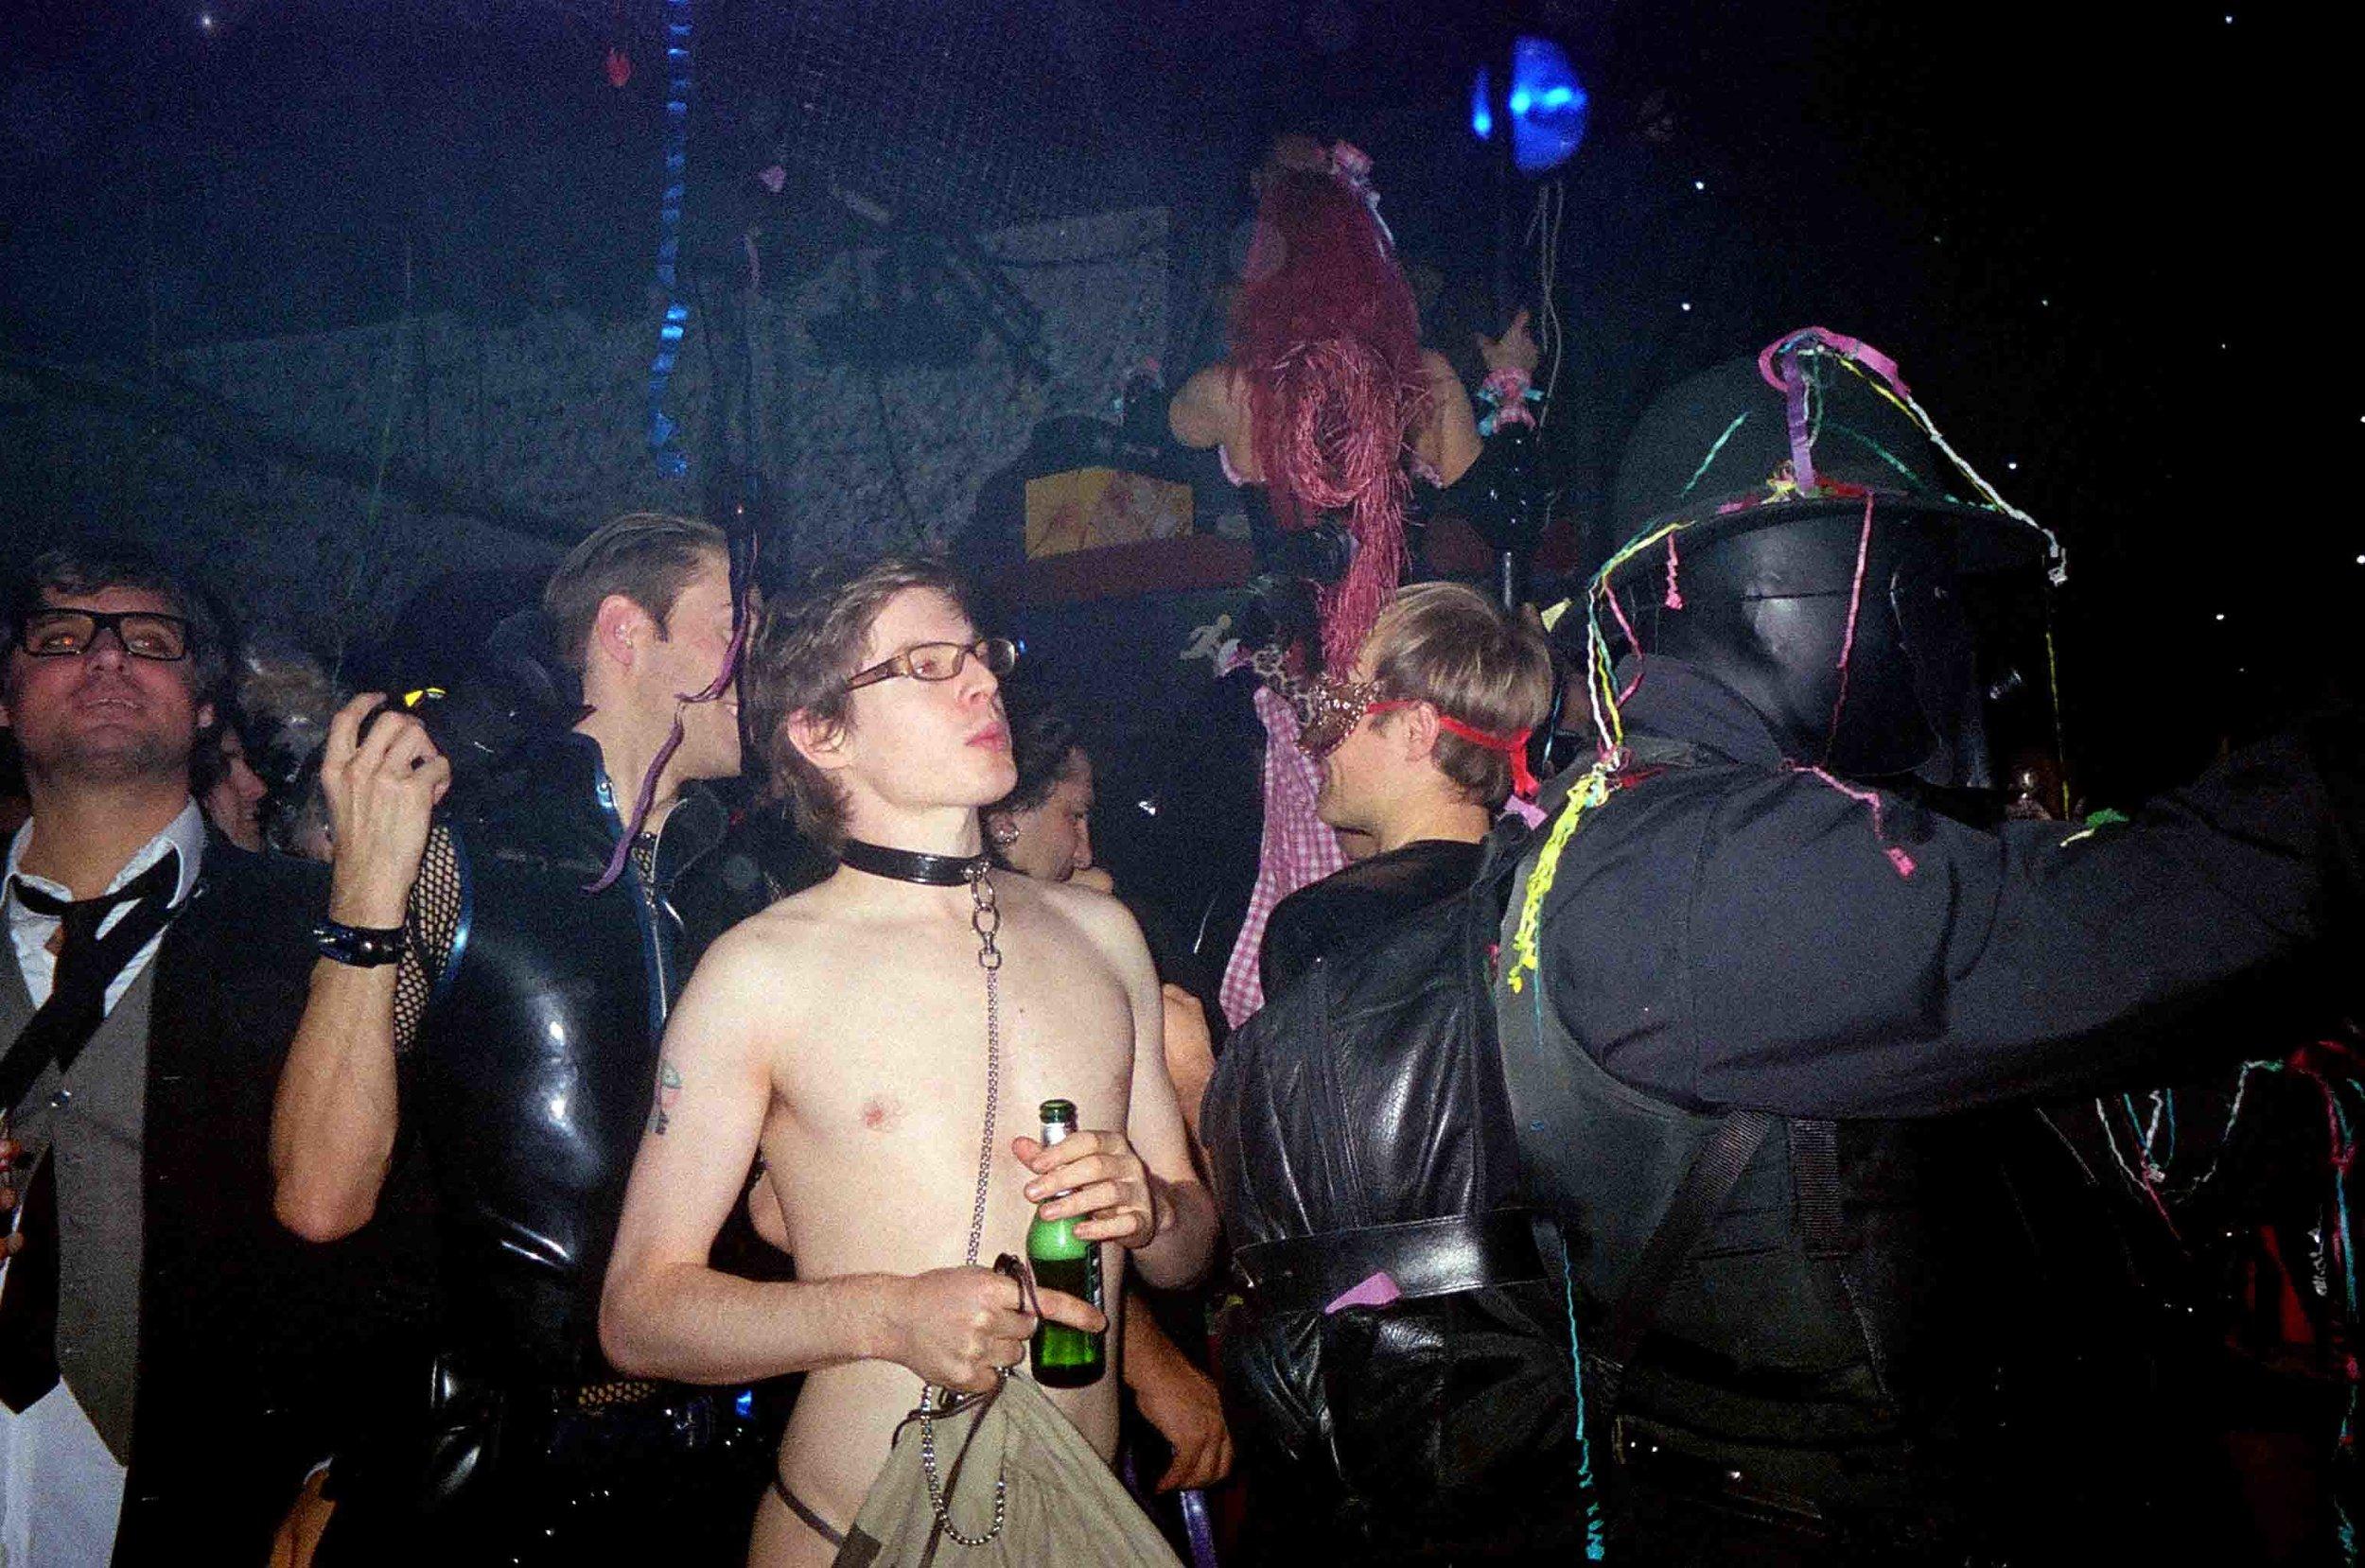 Happy New Year Caravaggio, 2006